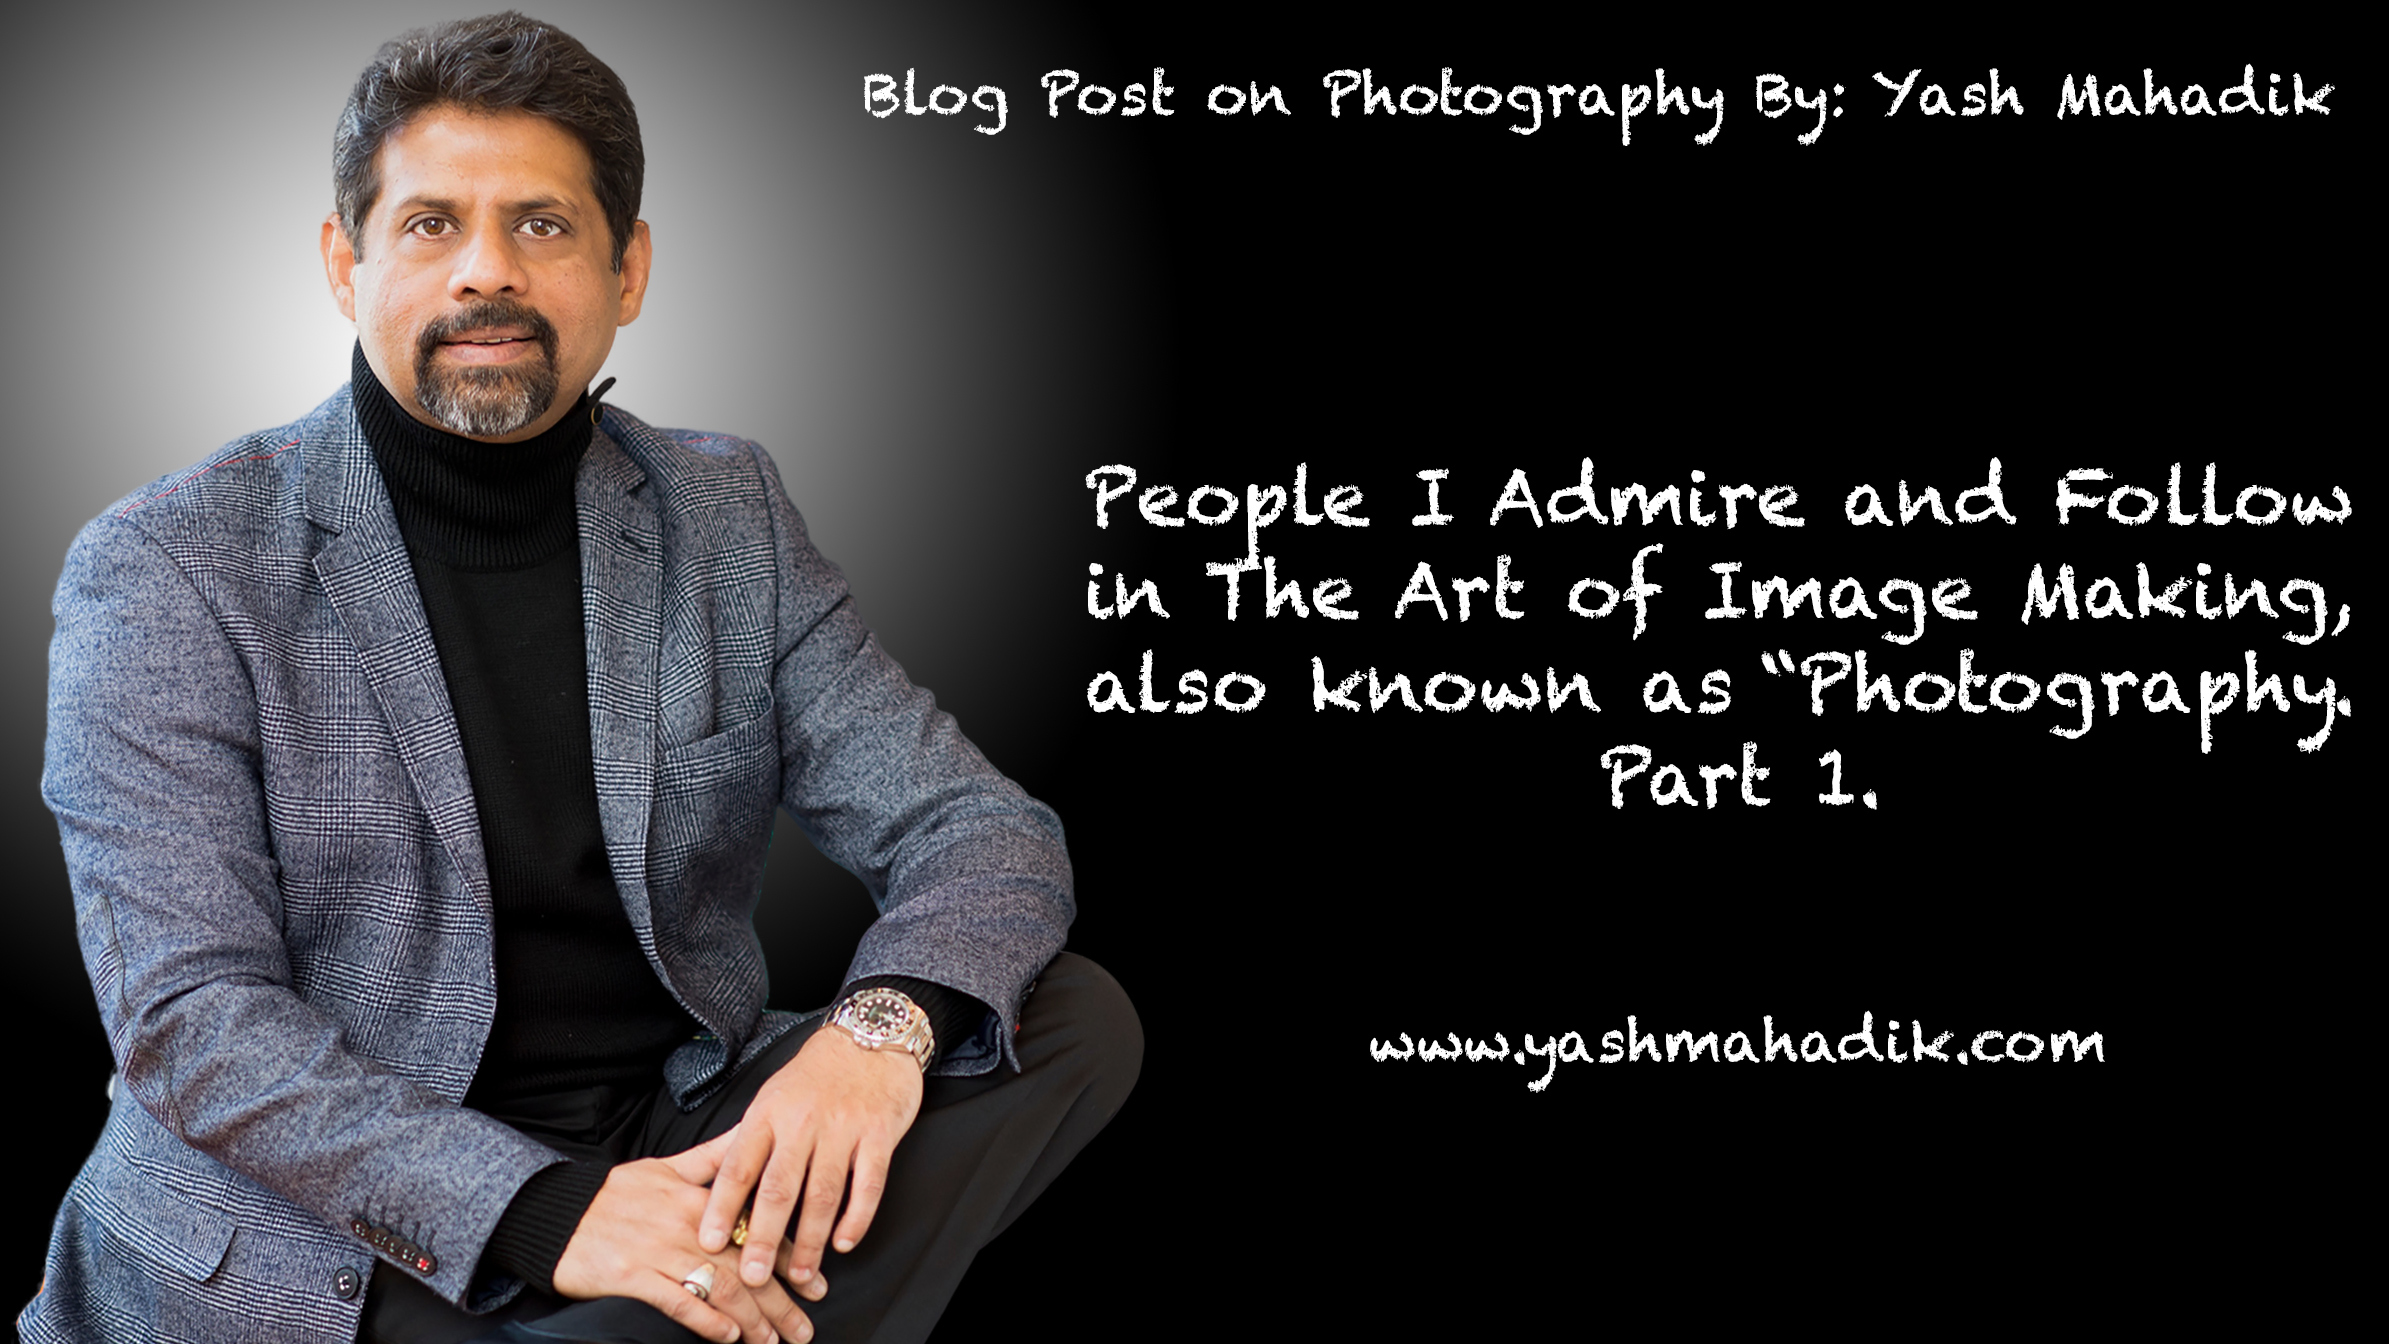 Yash Mahadik Blog Template